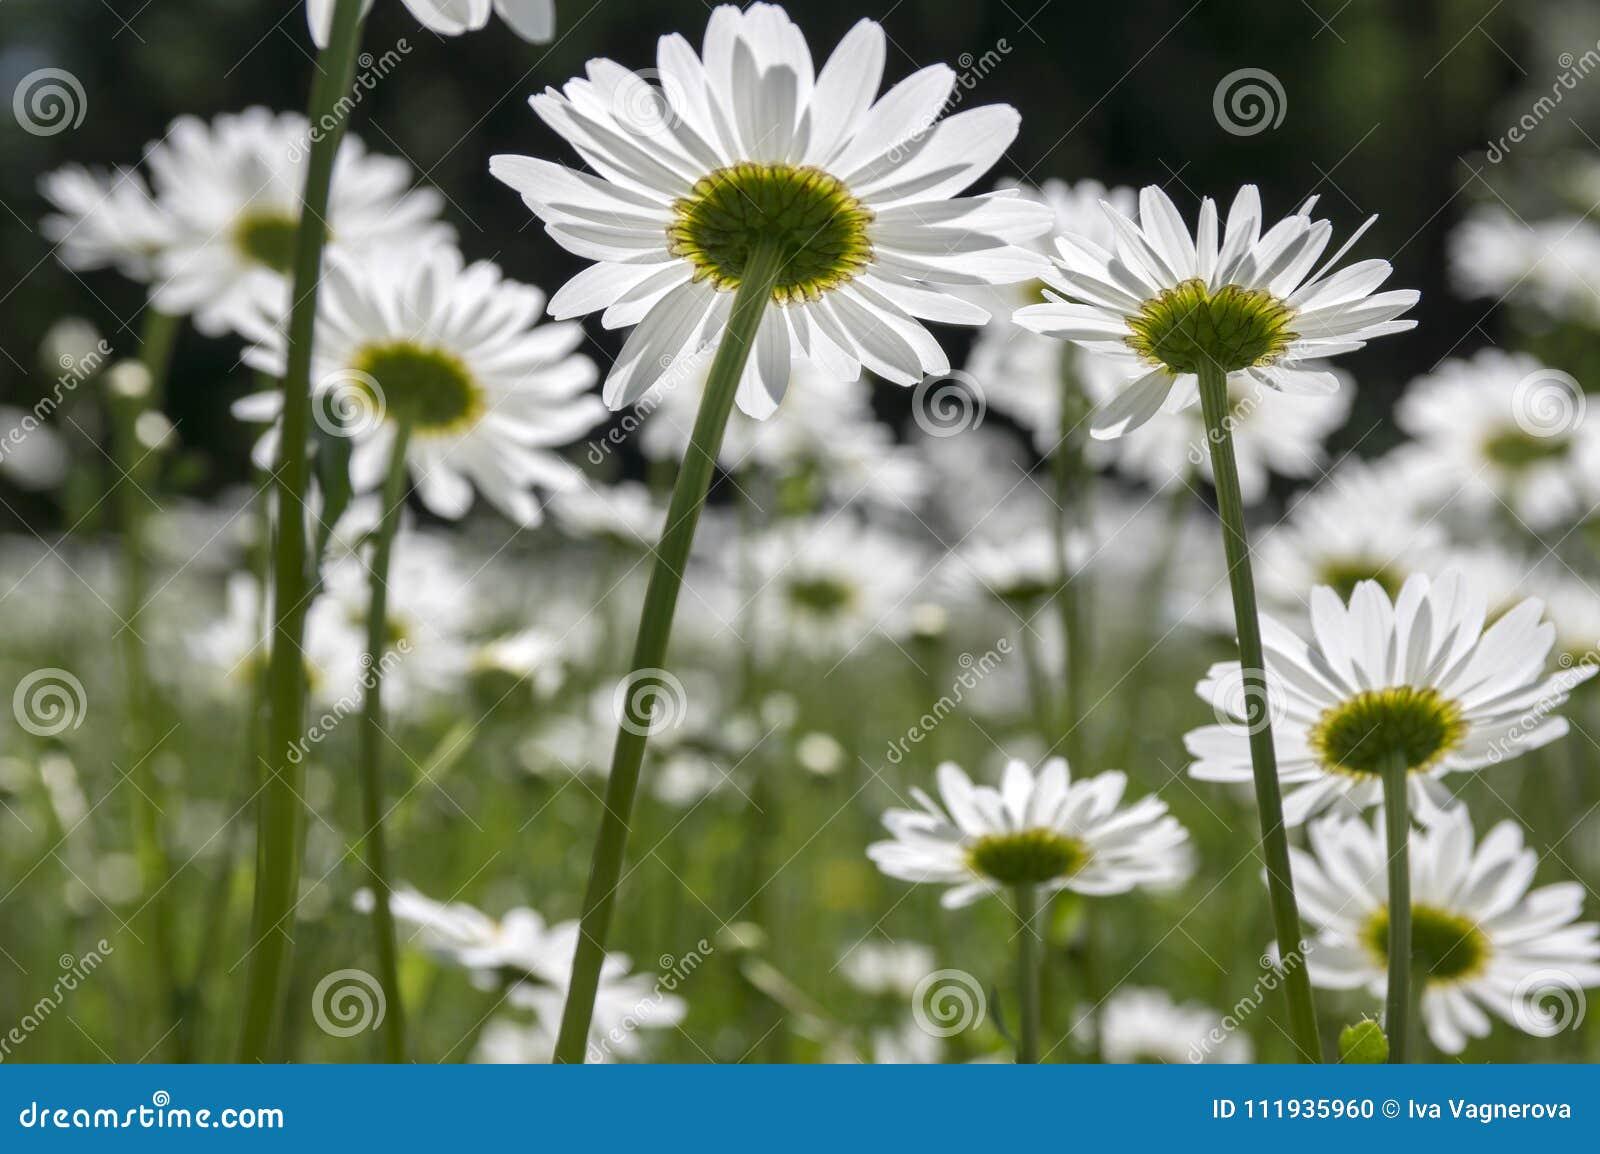 Leucanthemum vulgare meadows wild flower with white petals and download leucanthemum vulgare meadows wild flower with white petals and yellow center in bloom stock photo mightylinksfo